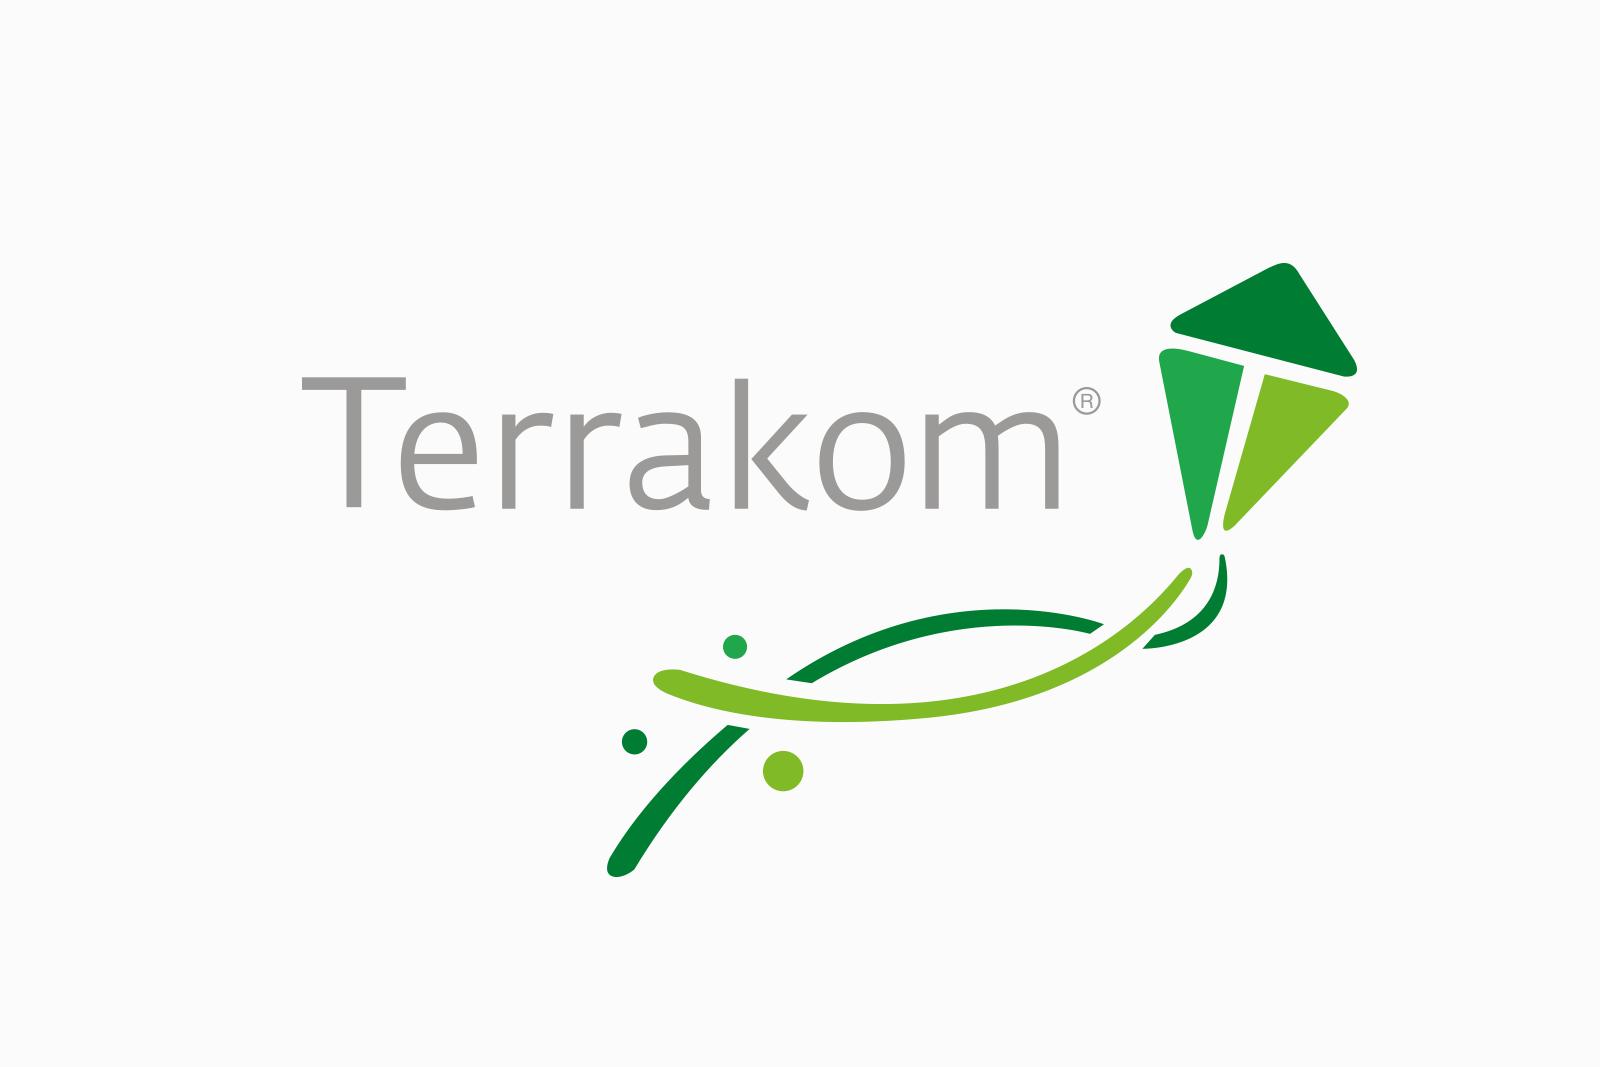 terrakom_logo_visual_identity.png